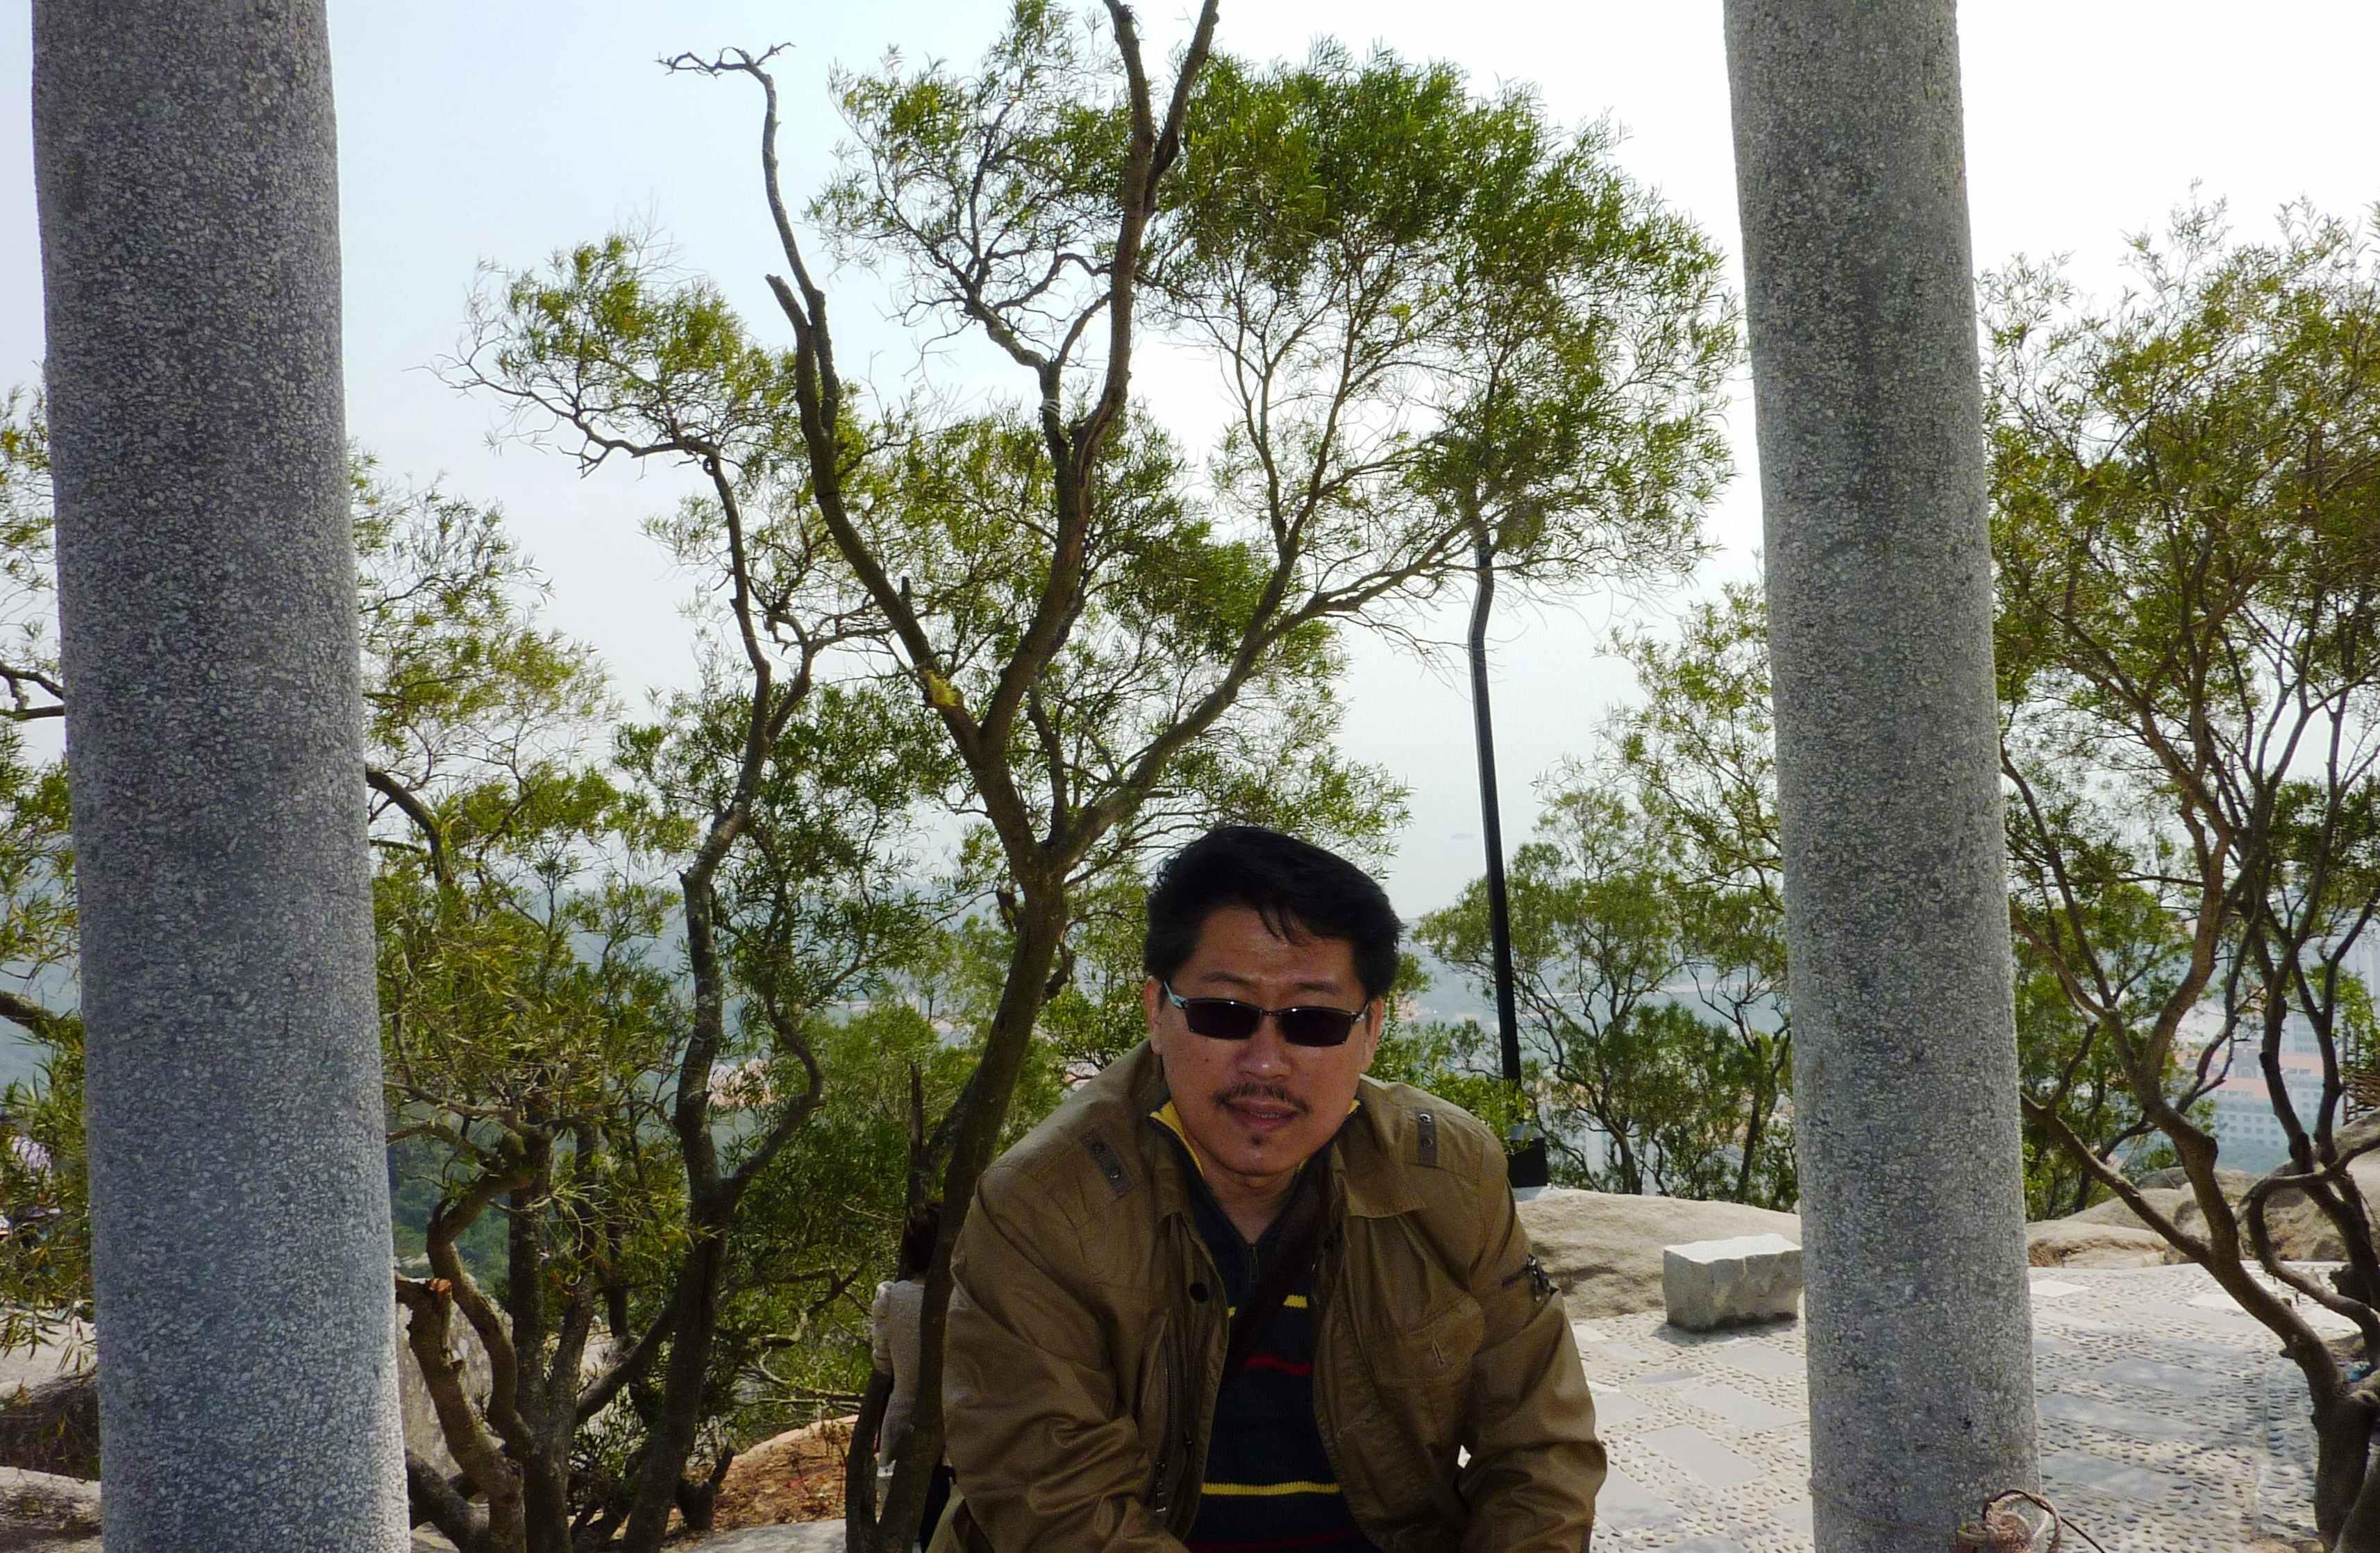 Master Soon in Xiamen, March 2011